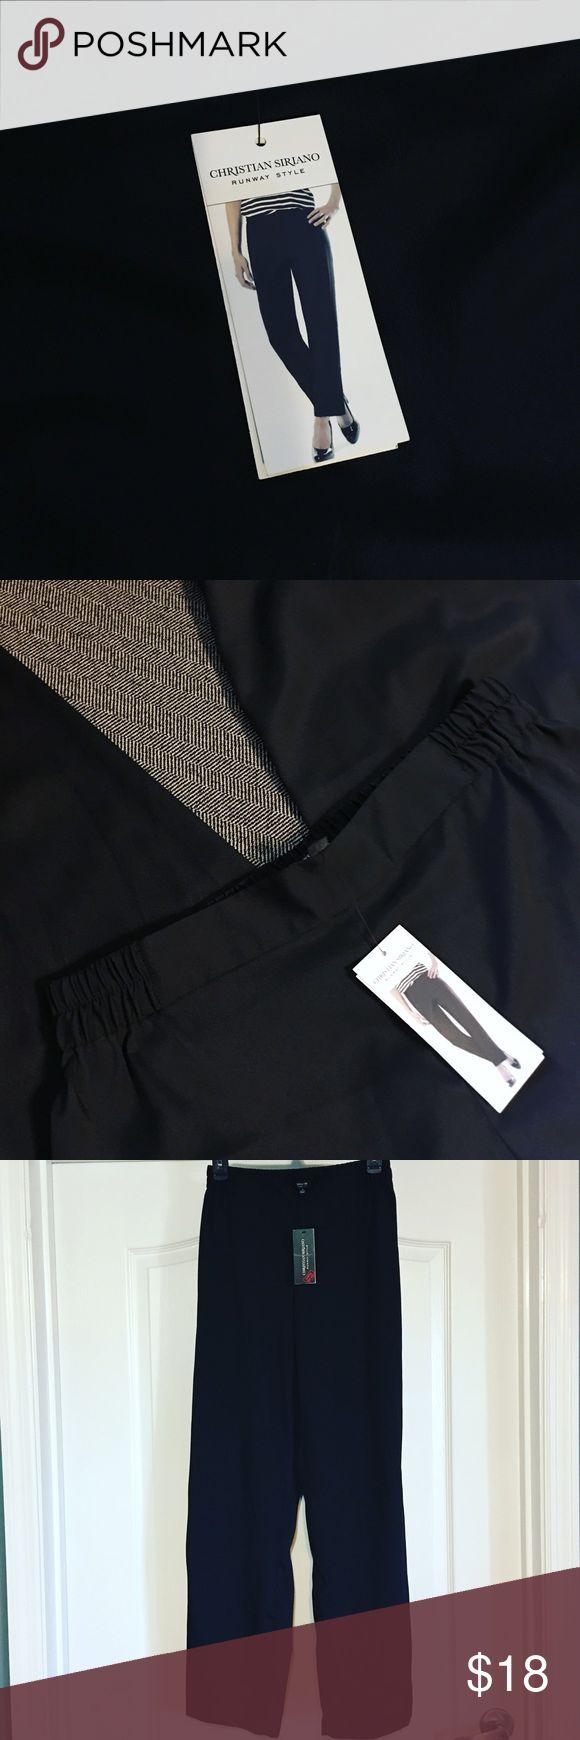 Christian Siriano Pants New black pants by Christian Siriano. Cozy and comfortable material and waist band. Christian Siriano Pants